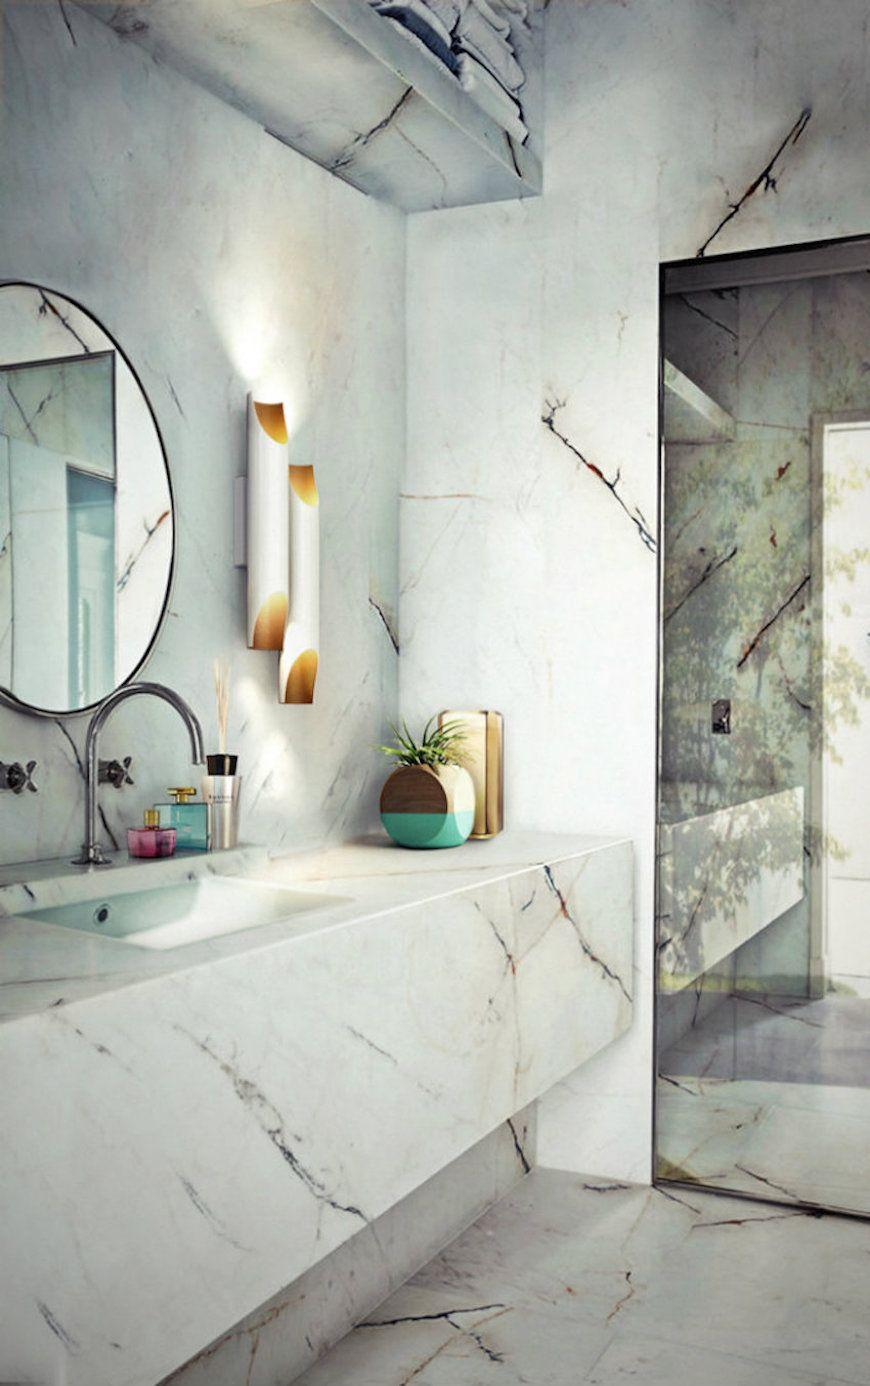 10 Lighting Design Ideas to Embellish your Industrial Bathroom ...